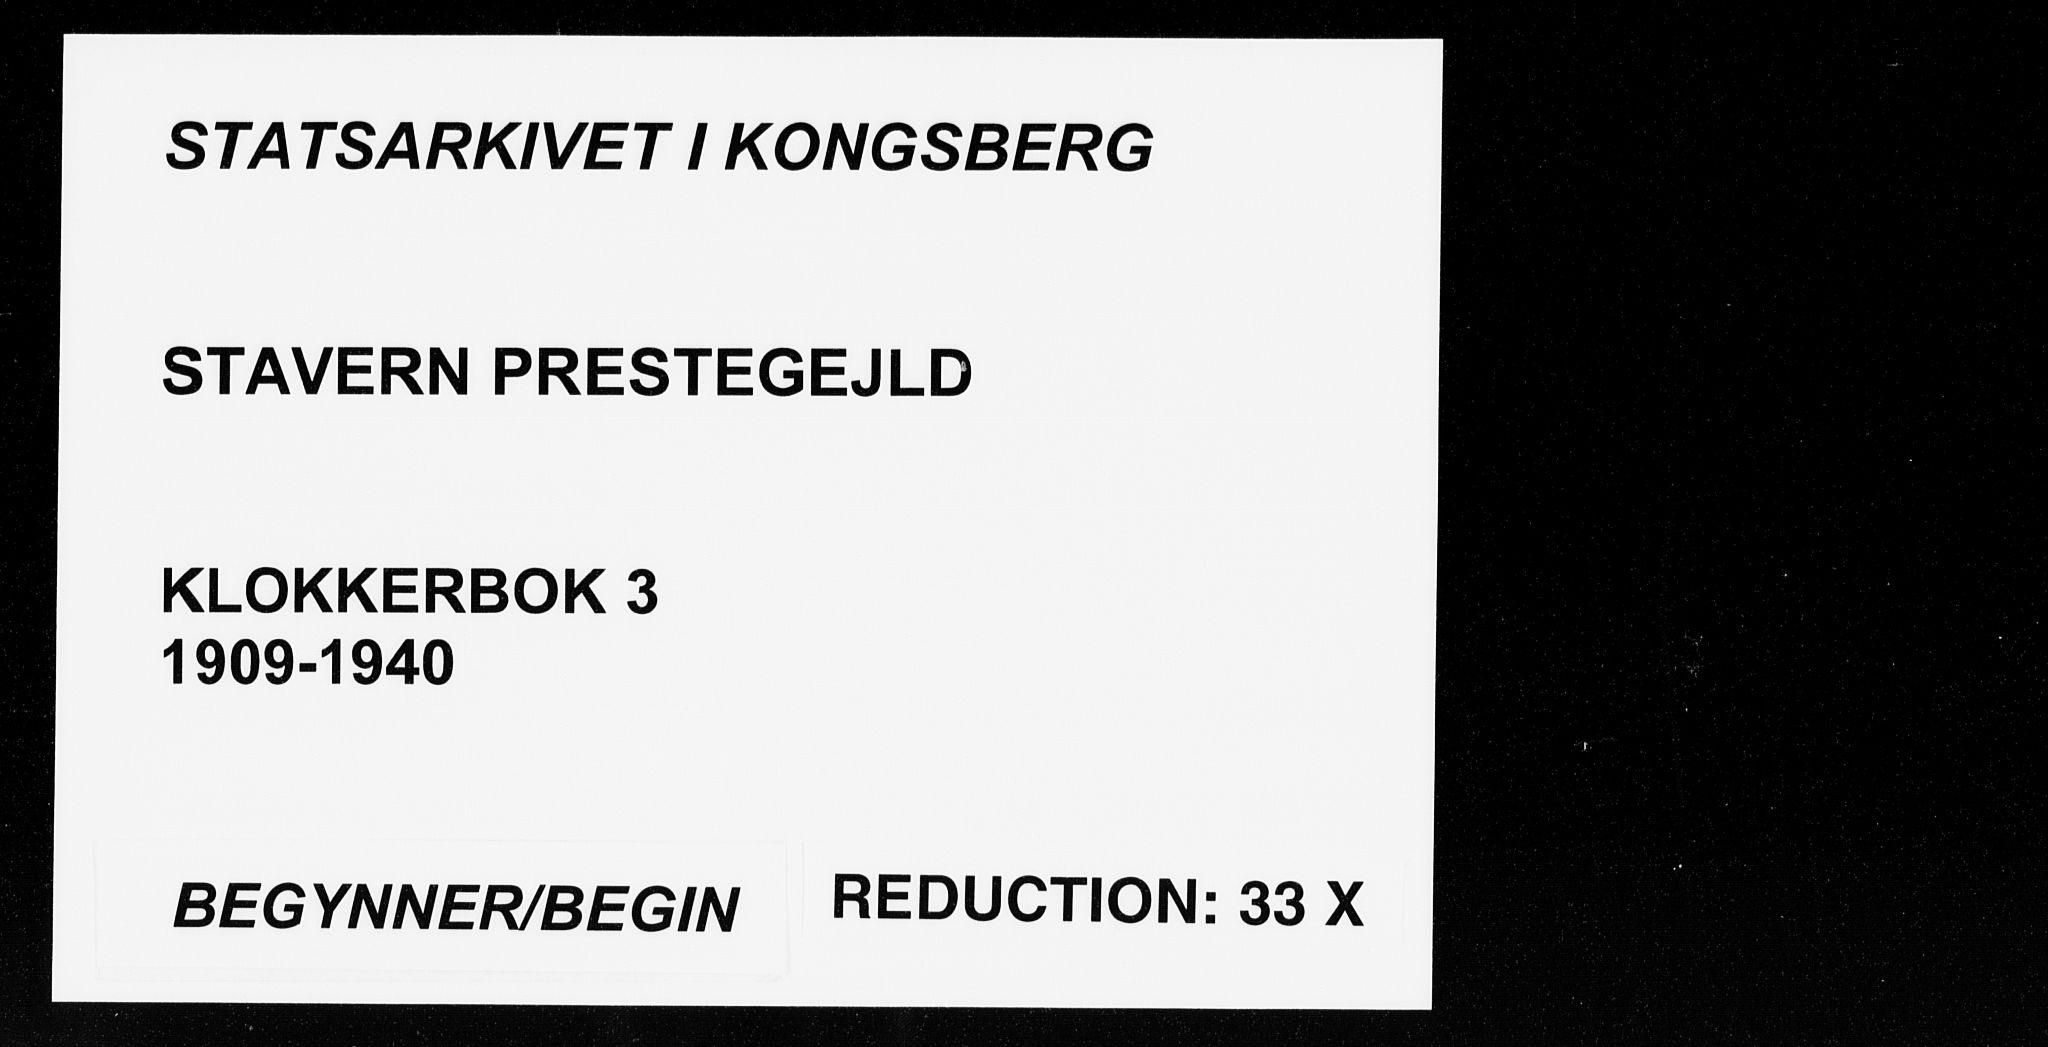 SAKO, Stavern kirkebøker, G/Ga/L0003: Klokkerbok nr. 3, 1909-1940